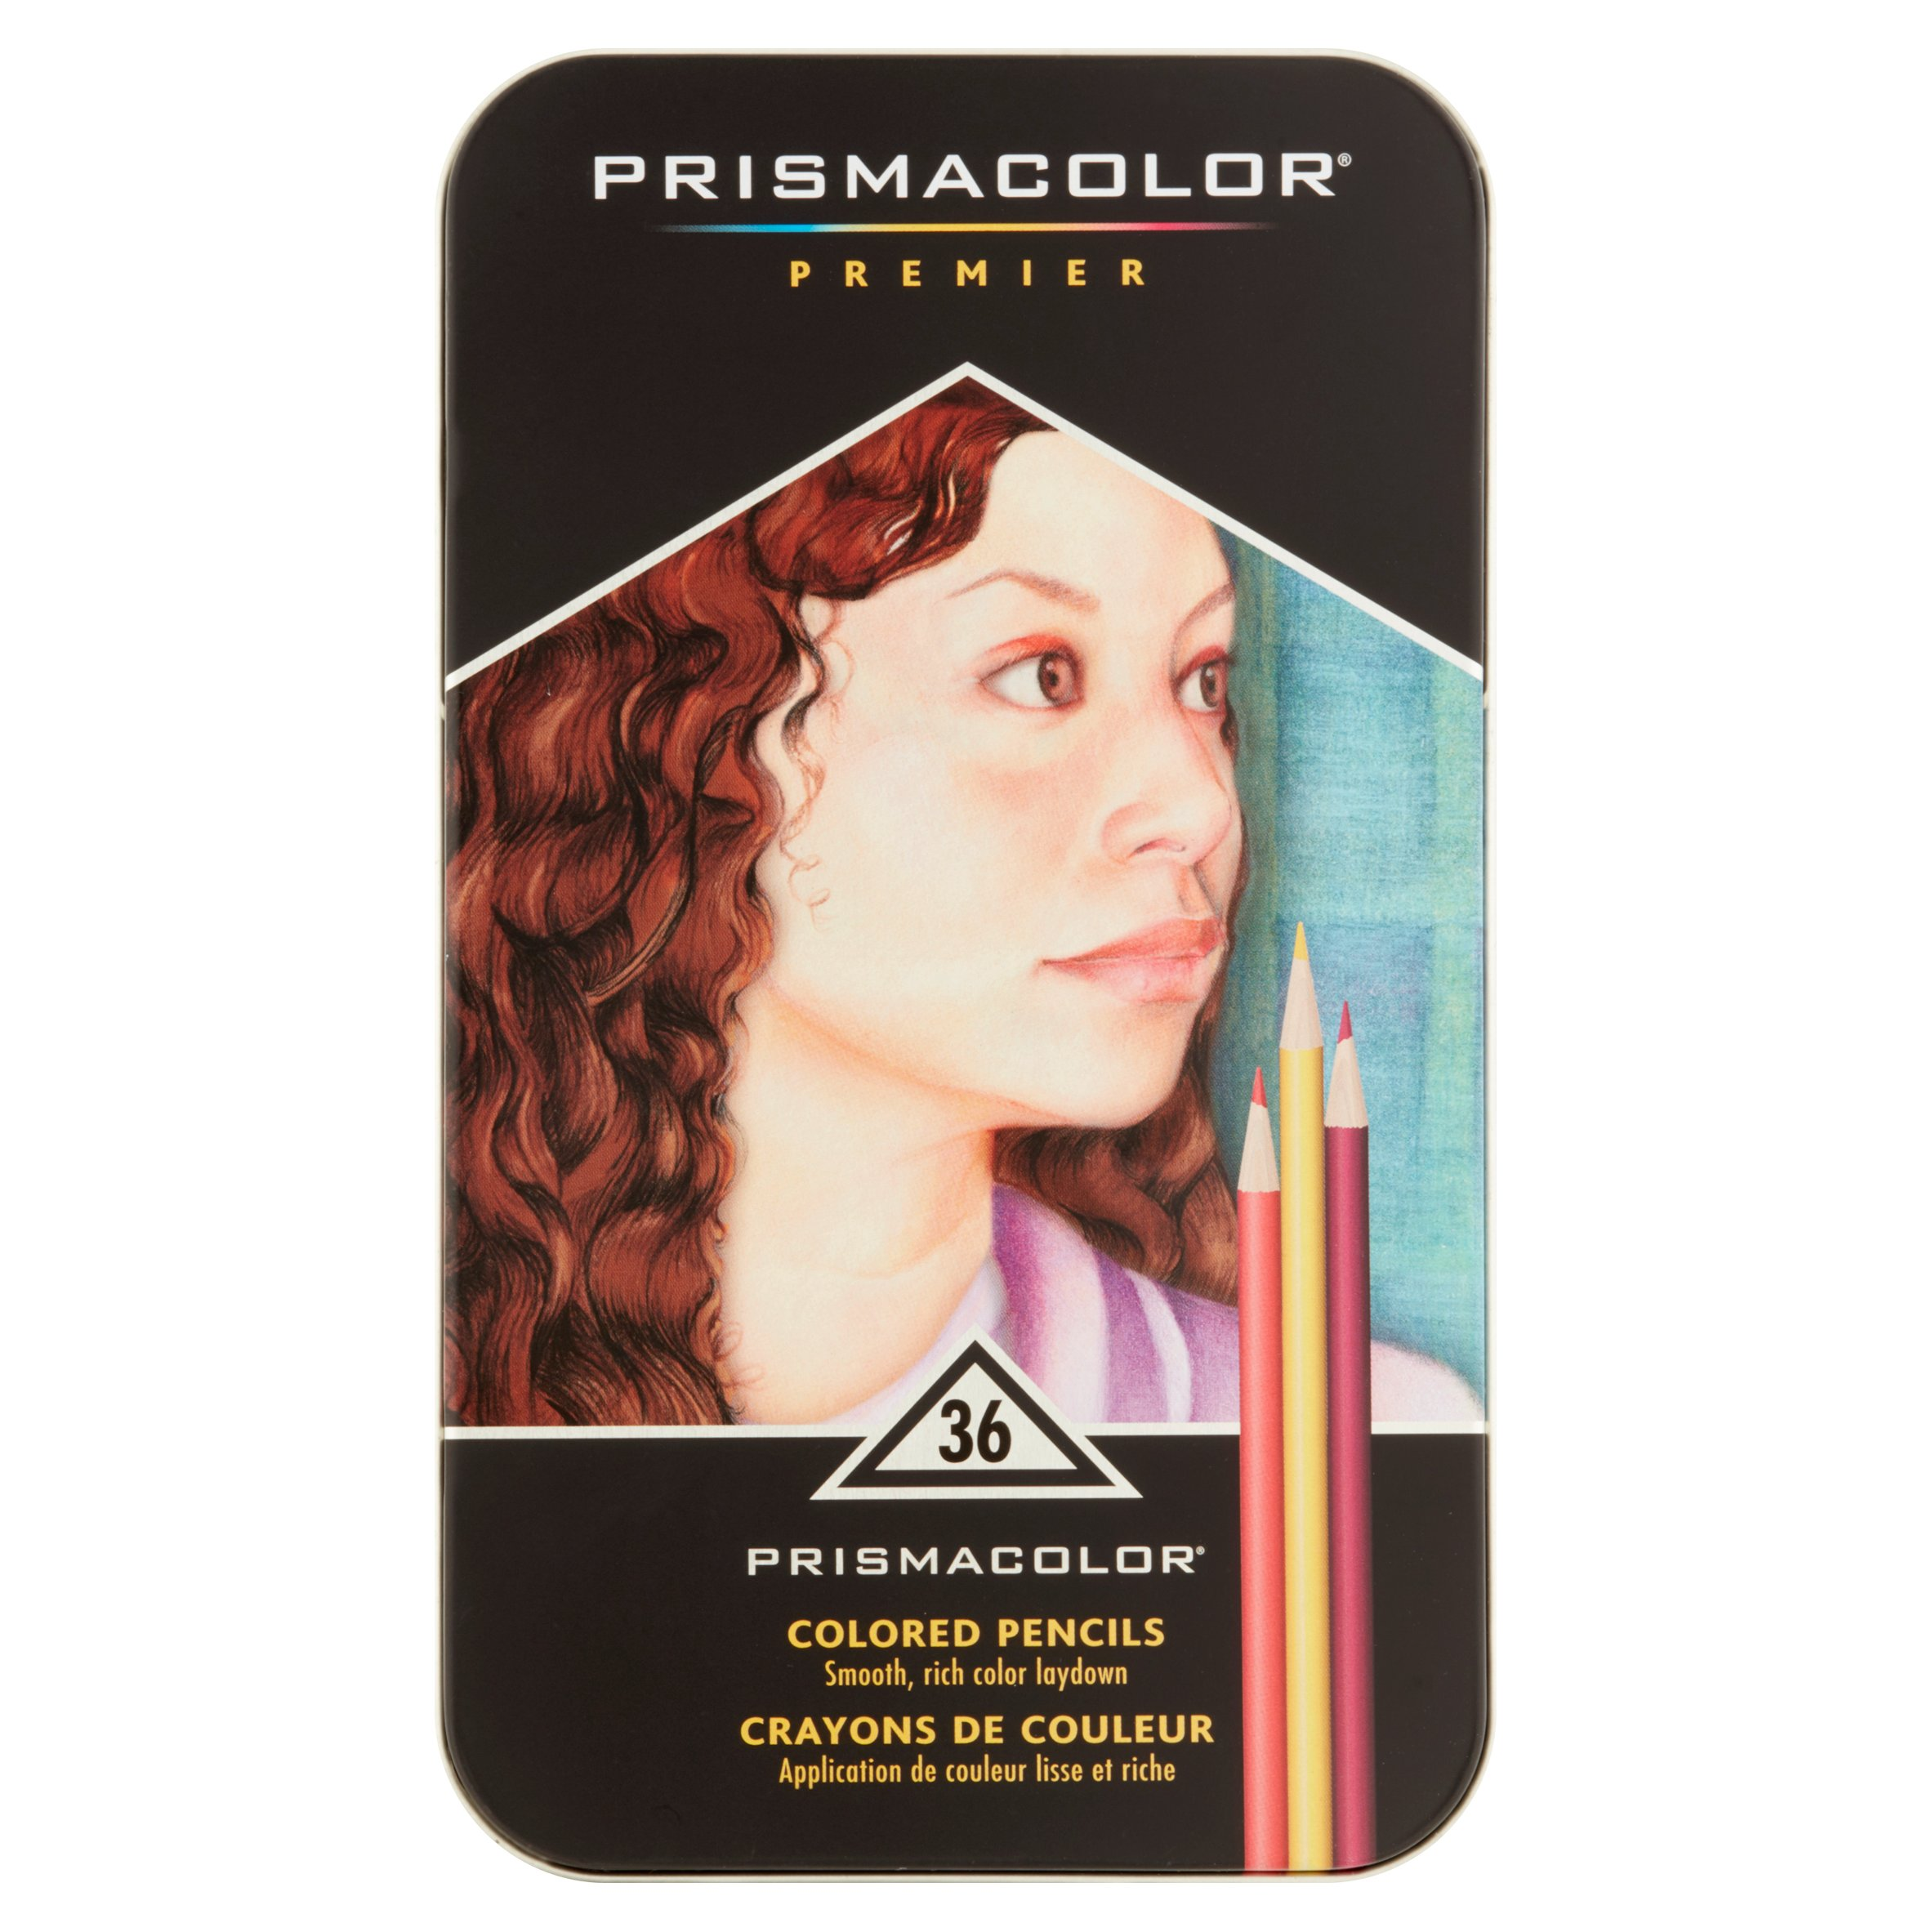 070735928856 Upc Prismacolor Premier Colored Pencil Set Of 36 Upc Lookup